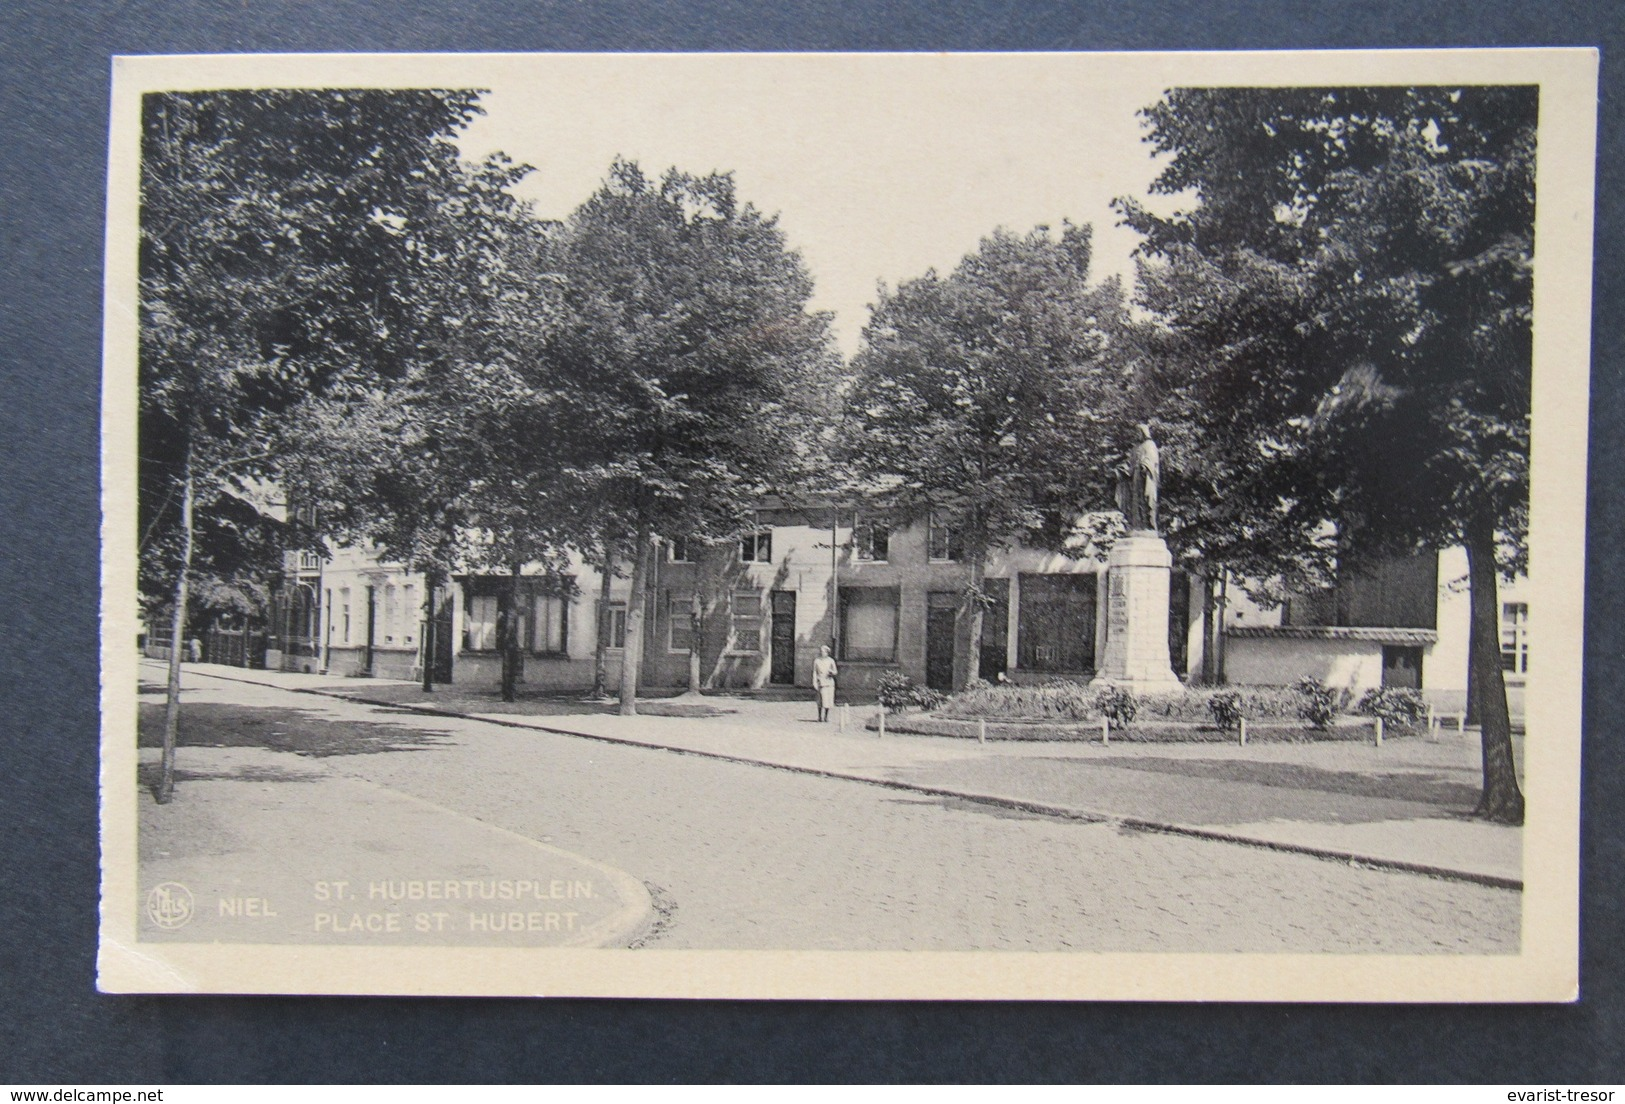 Cpa/pk Niel St Hubertusplein - Niel